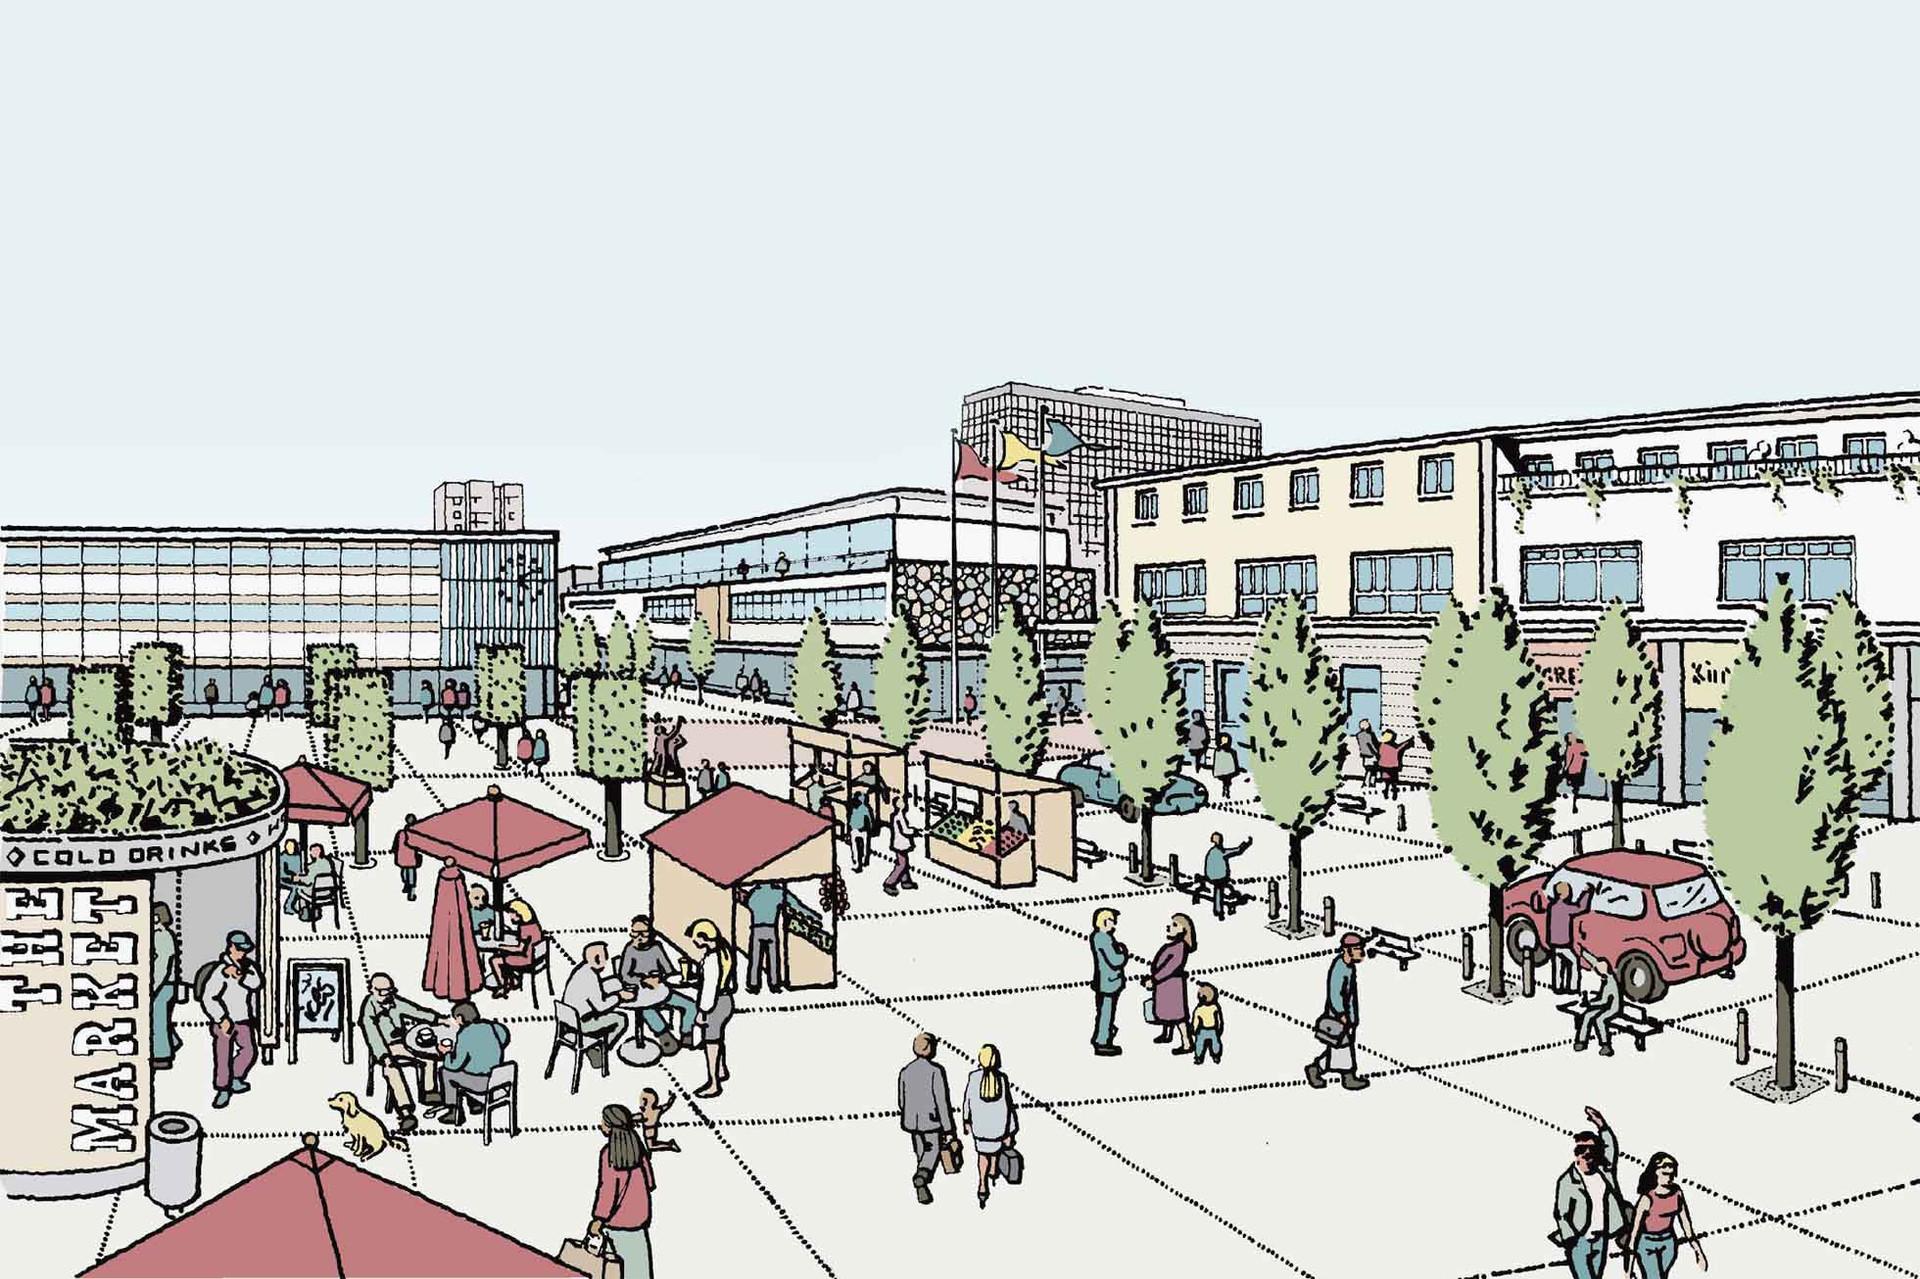 Market Square regeneration Illustration